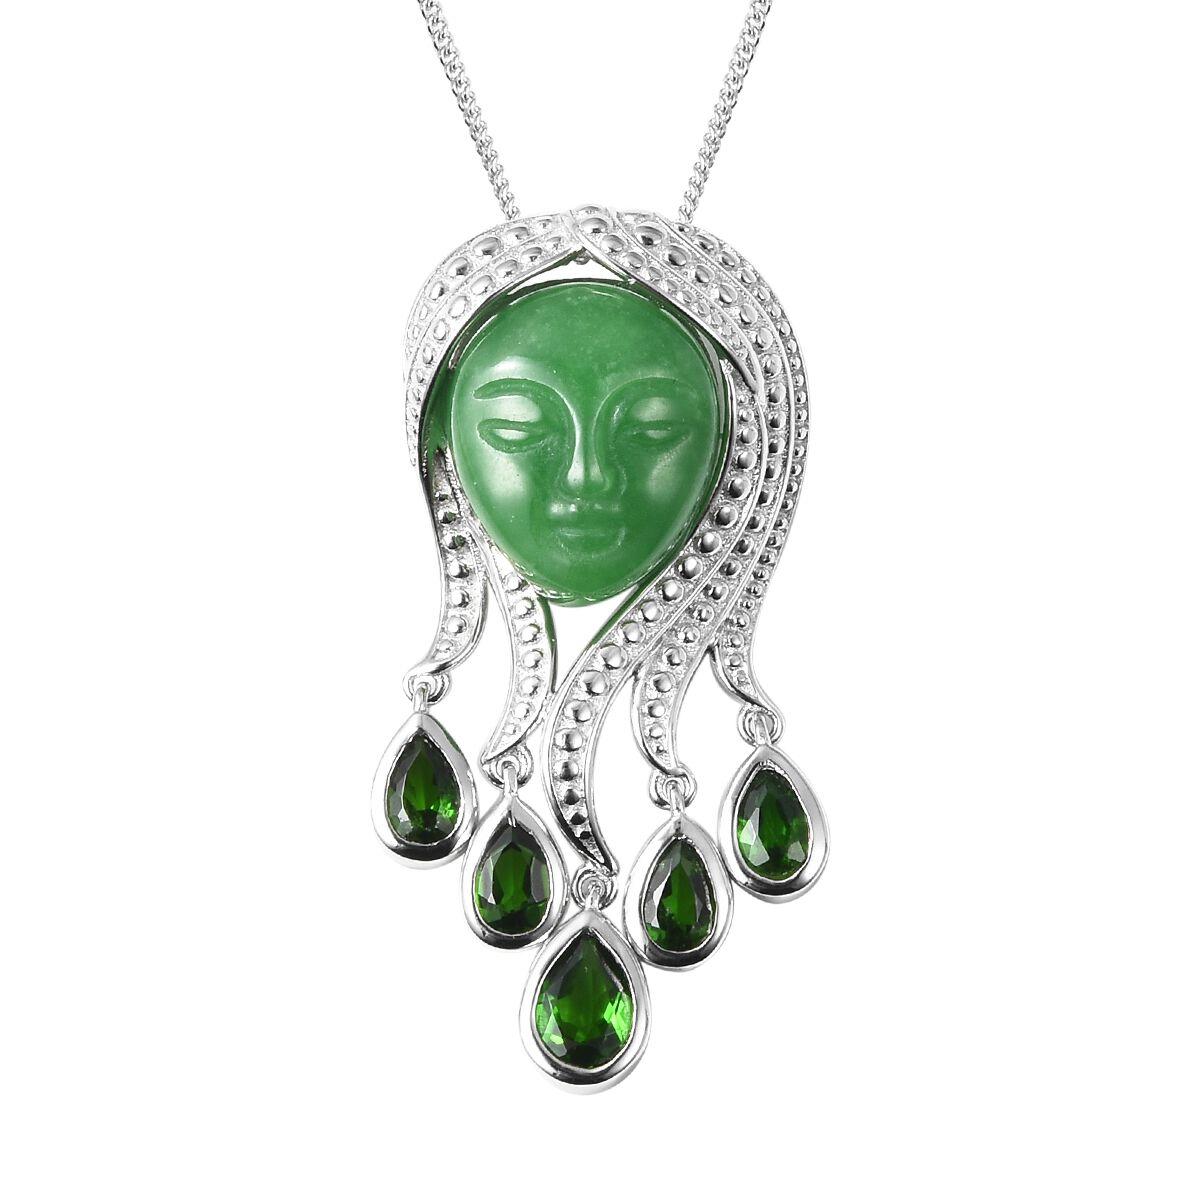 TJC 925 Sterling Silver Pear Brazillian ite Drop Pendant for Women /& Girls 4 ct